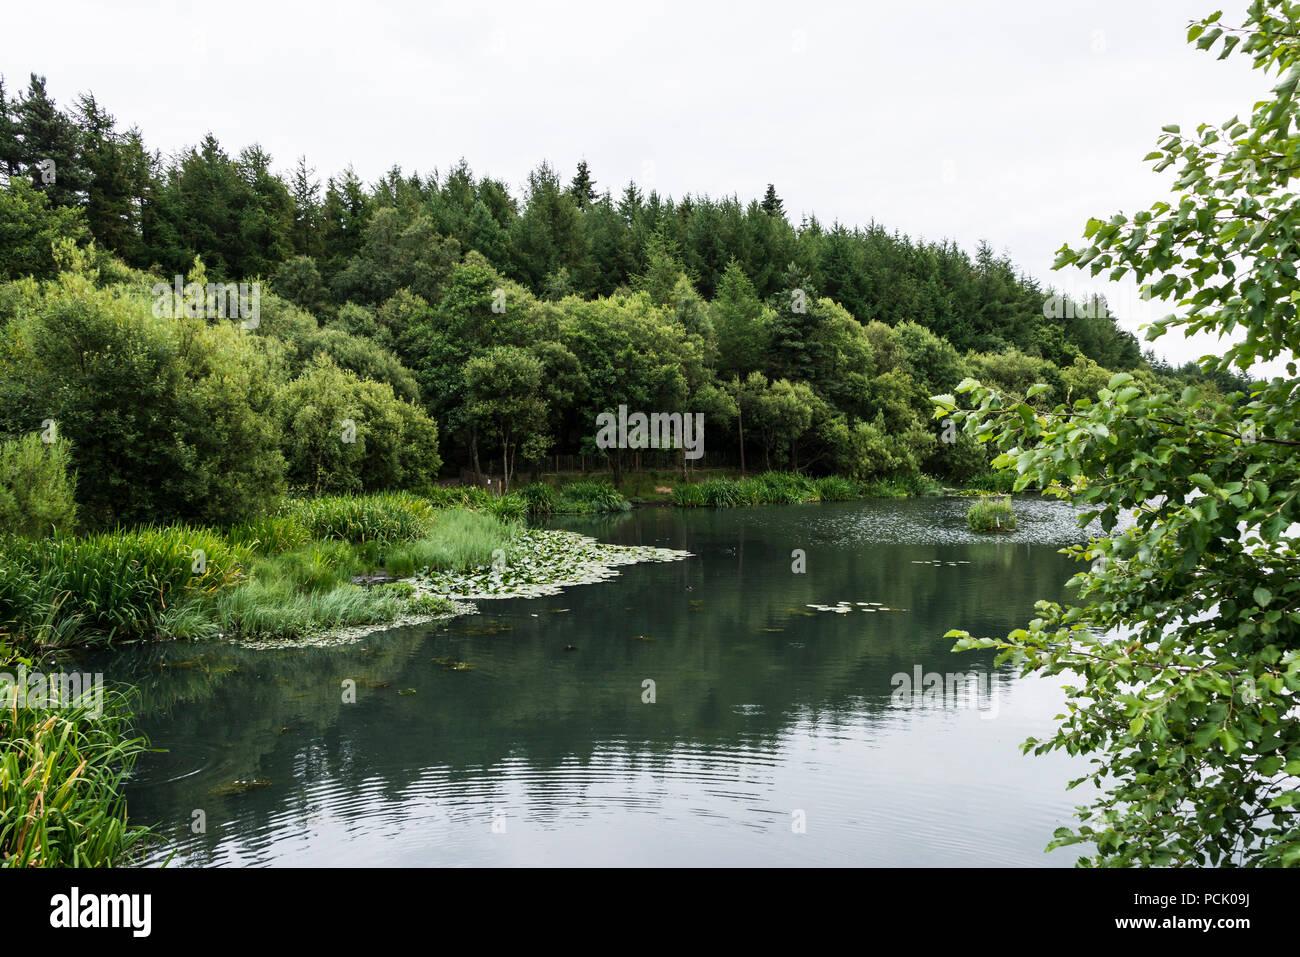 Eliburn reservoir, Livingston, West Lothian, Scotland - Stock Image